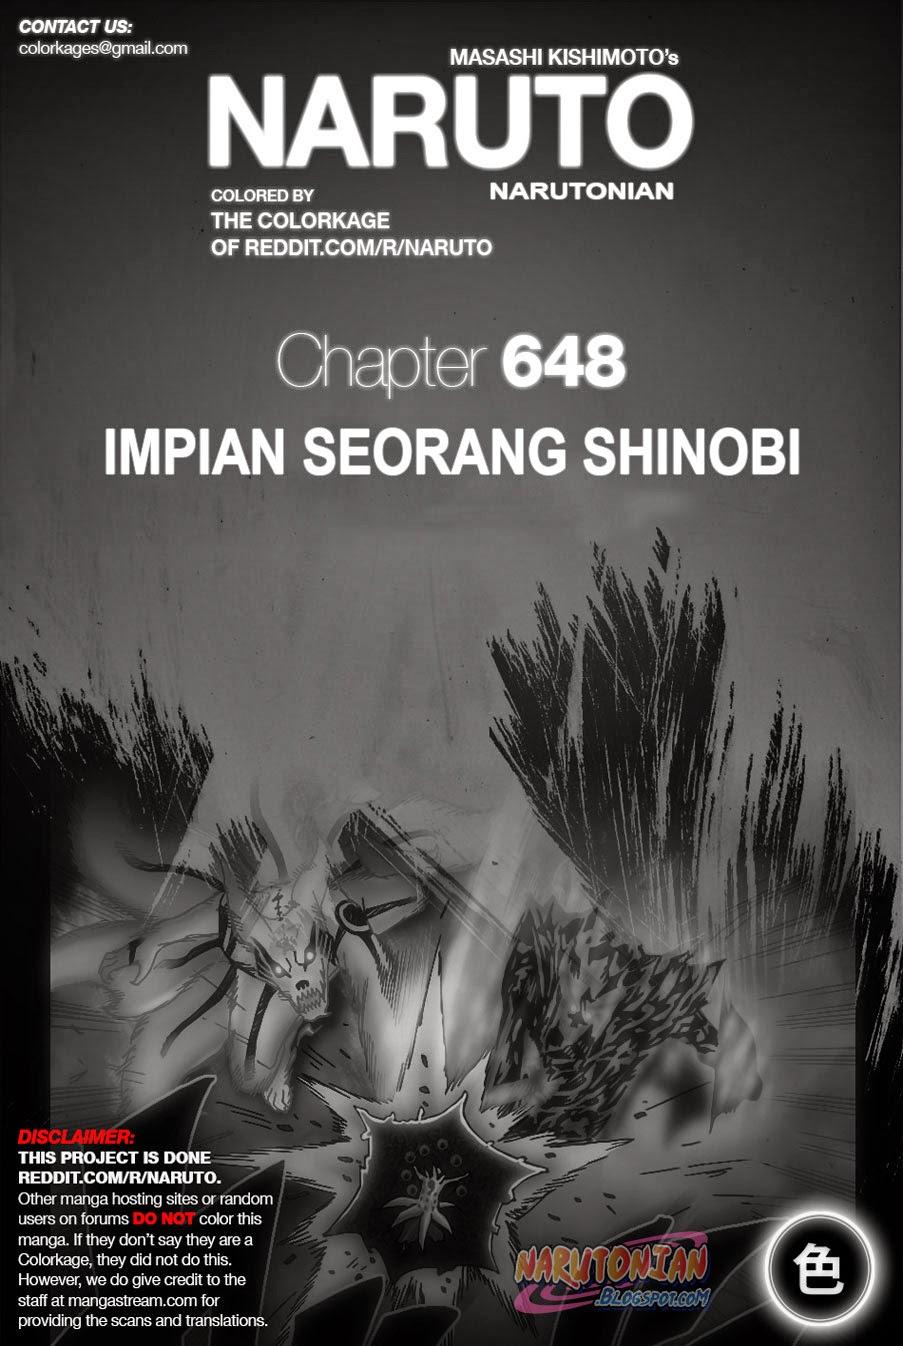 Dilarang COPAS - situs resmi www.mangacanblog.com - Komik naruto berwarna 648 - impian seorang shinobi 649 Indonesia naruto berwarna 648 - impian seorang shinobi Terbaru |Baca Manga Komik Indonesia|Mangacan